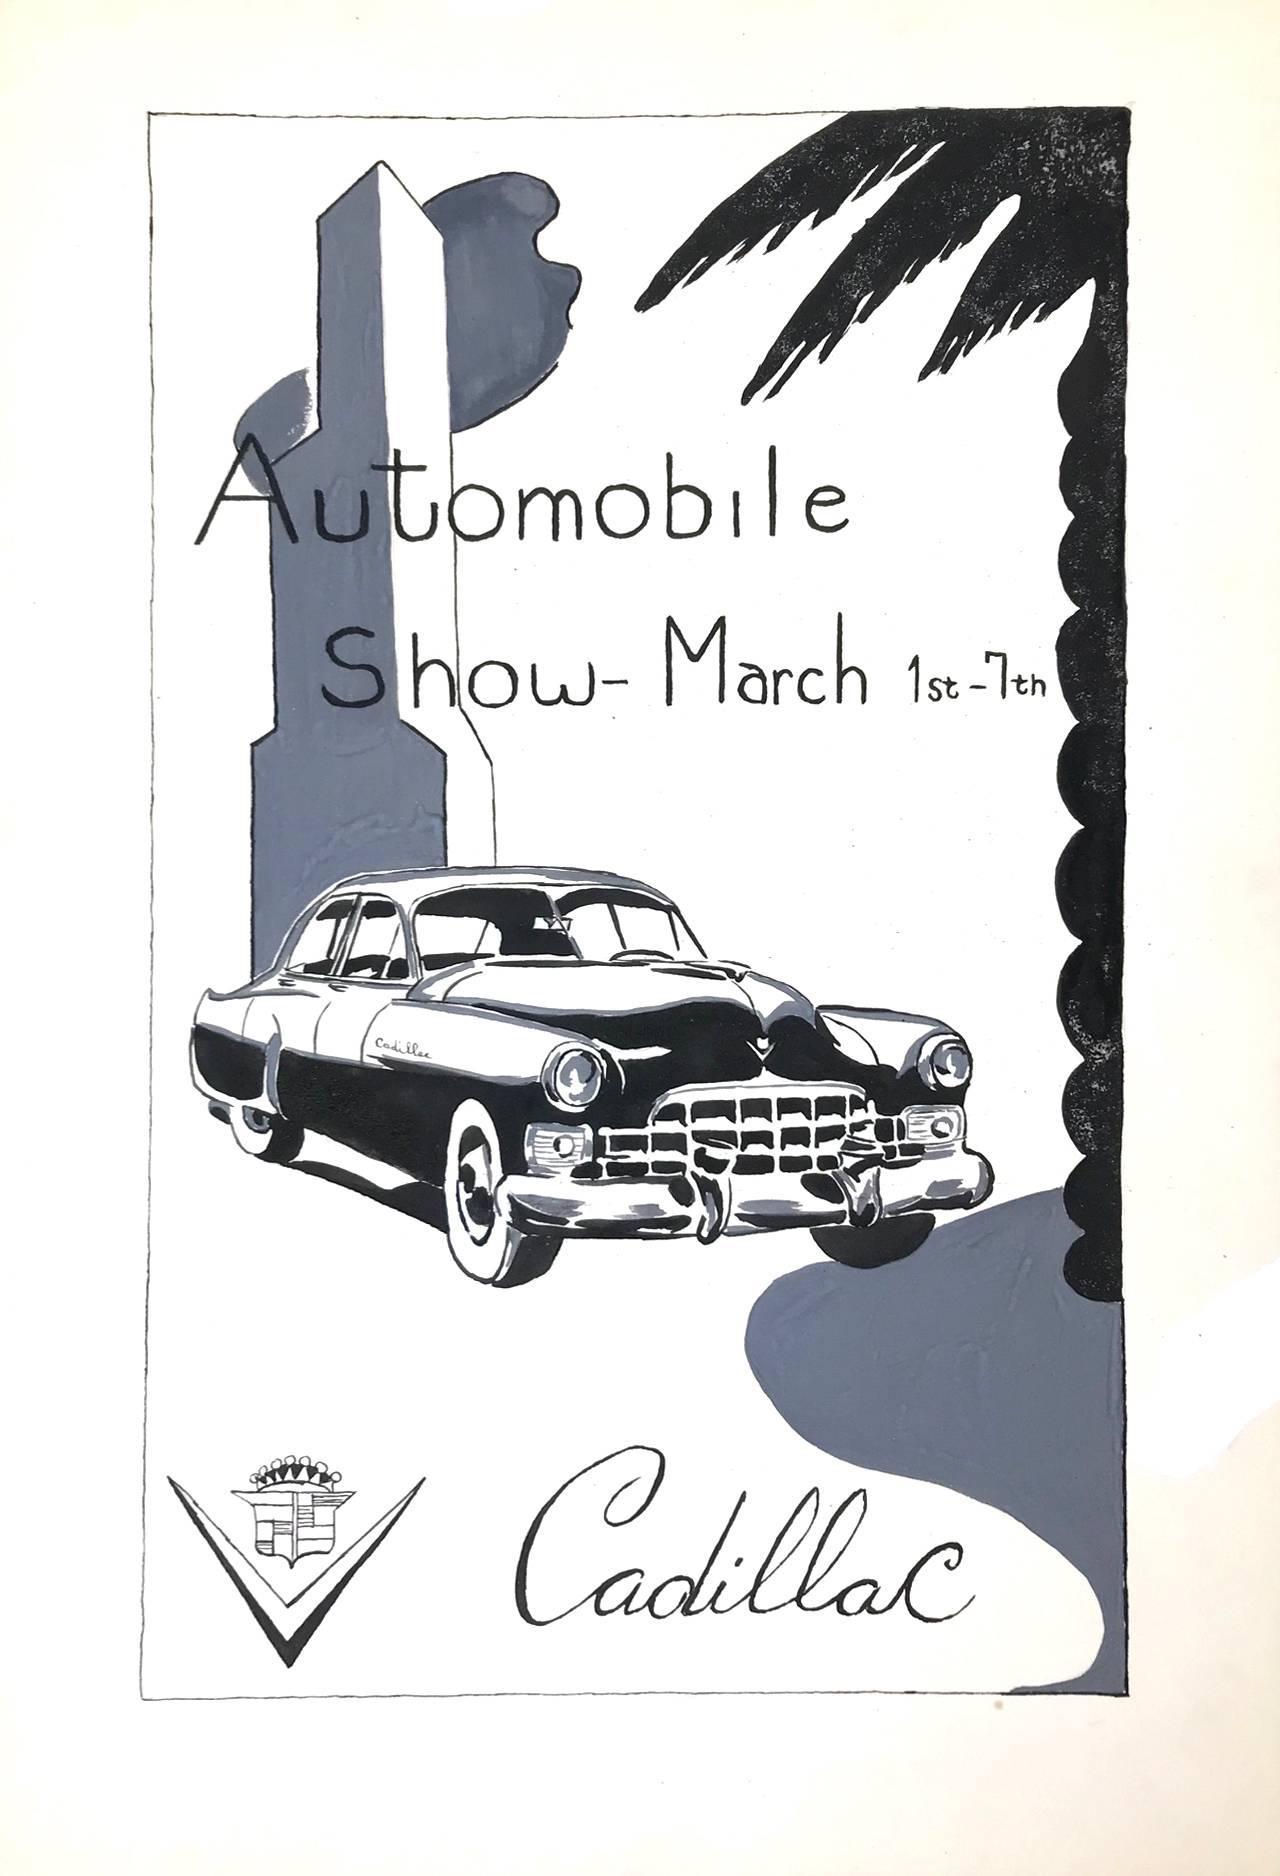 Untitled (Cadillac Automobile Show)